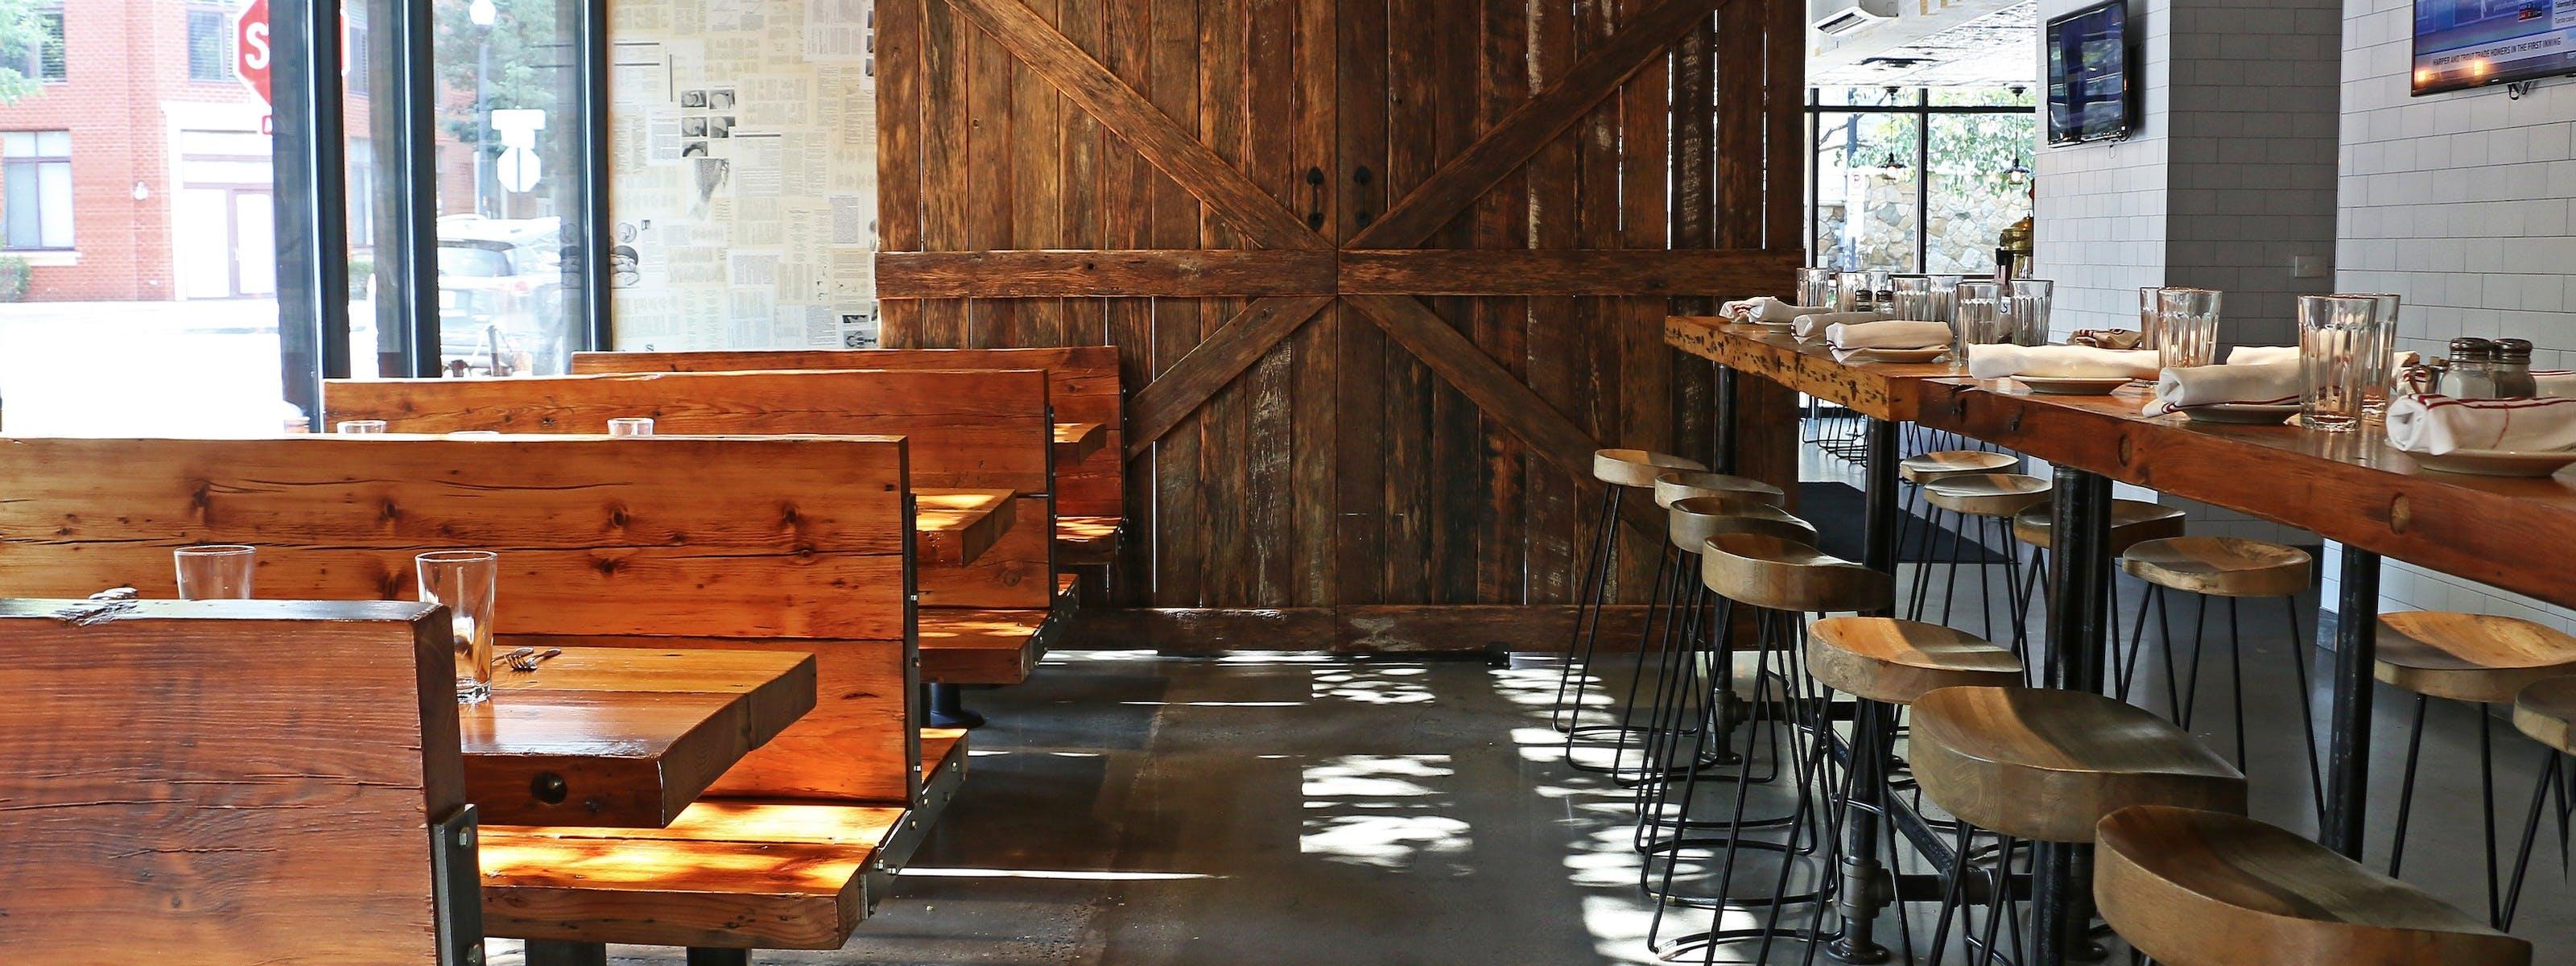 The Best Arlington Restaurants - Arlington - Washington DC - The Infatuation